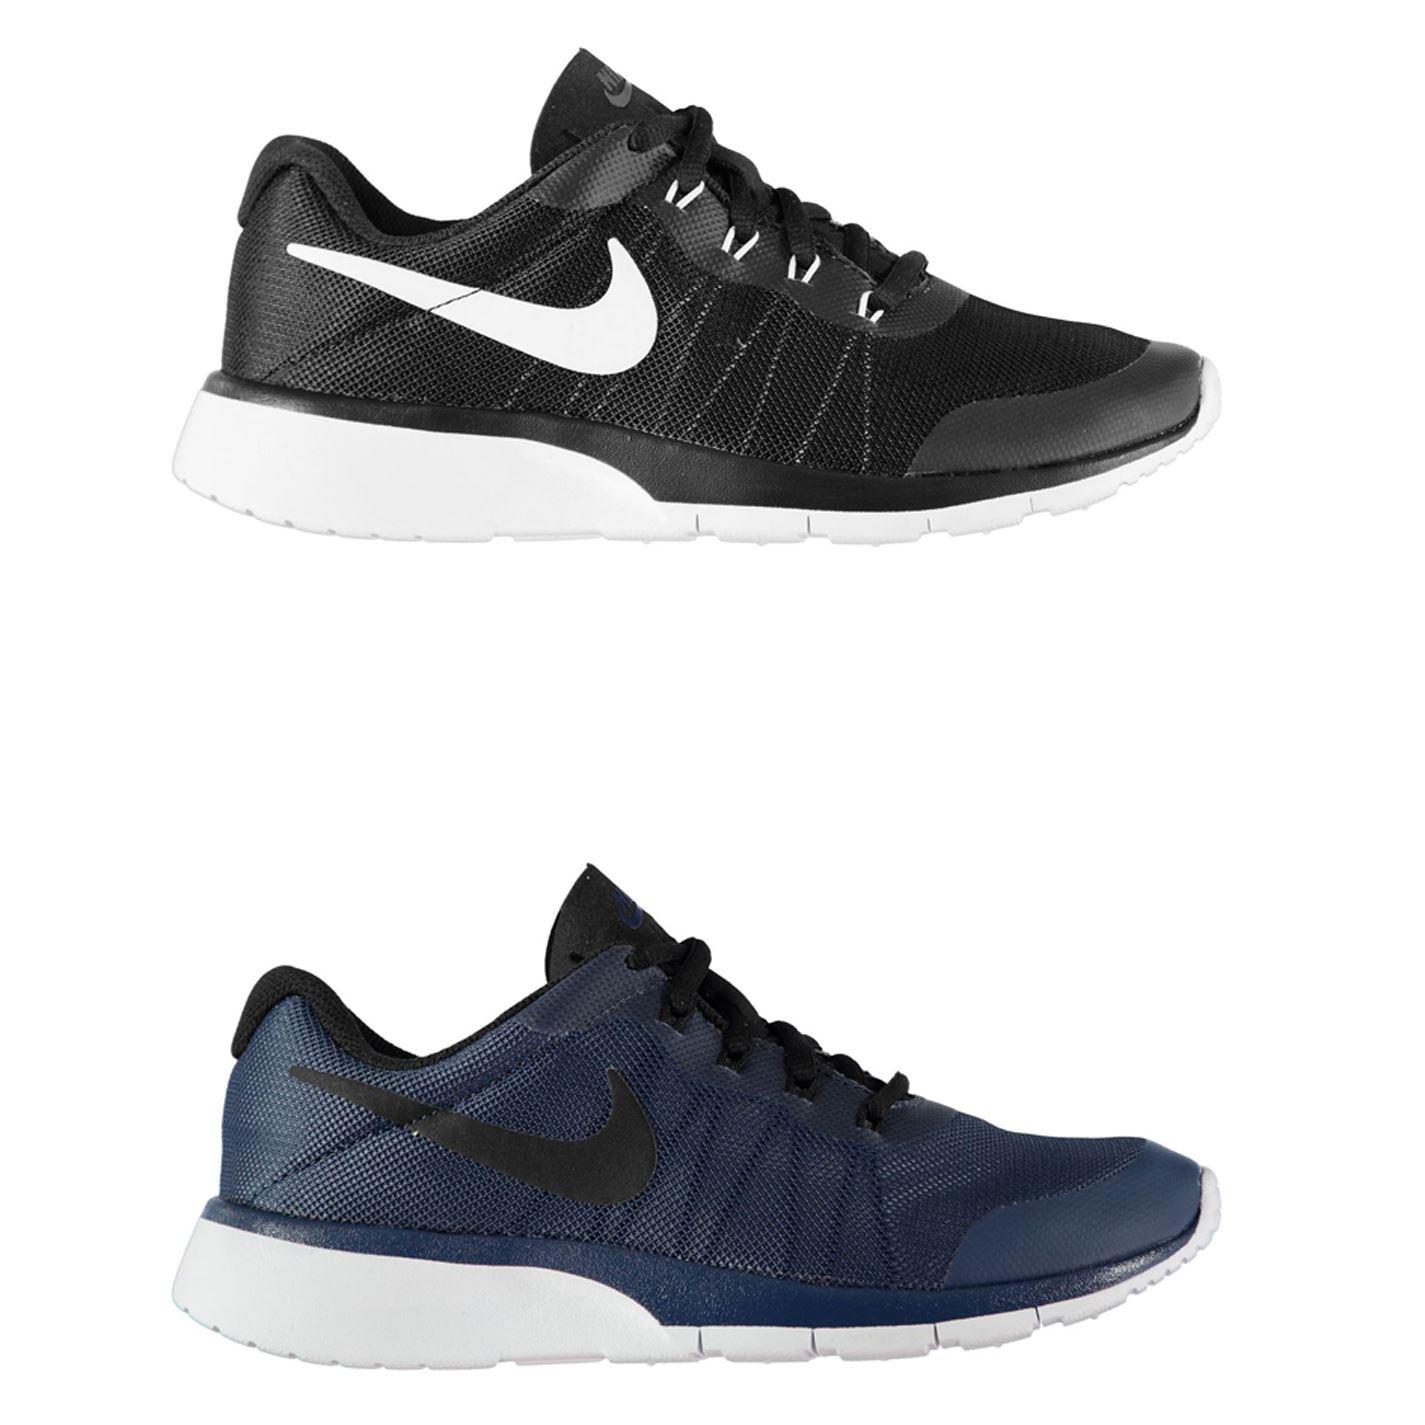 the best attitude 00df0 53f96 ... Nike Tanjun Racer Junior Boys Trainers Shoes Footwear ...